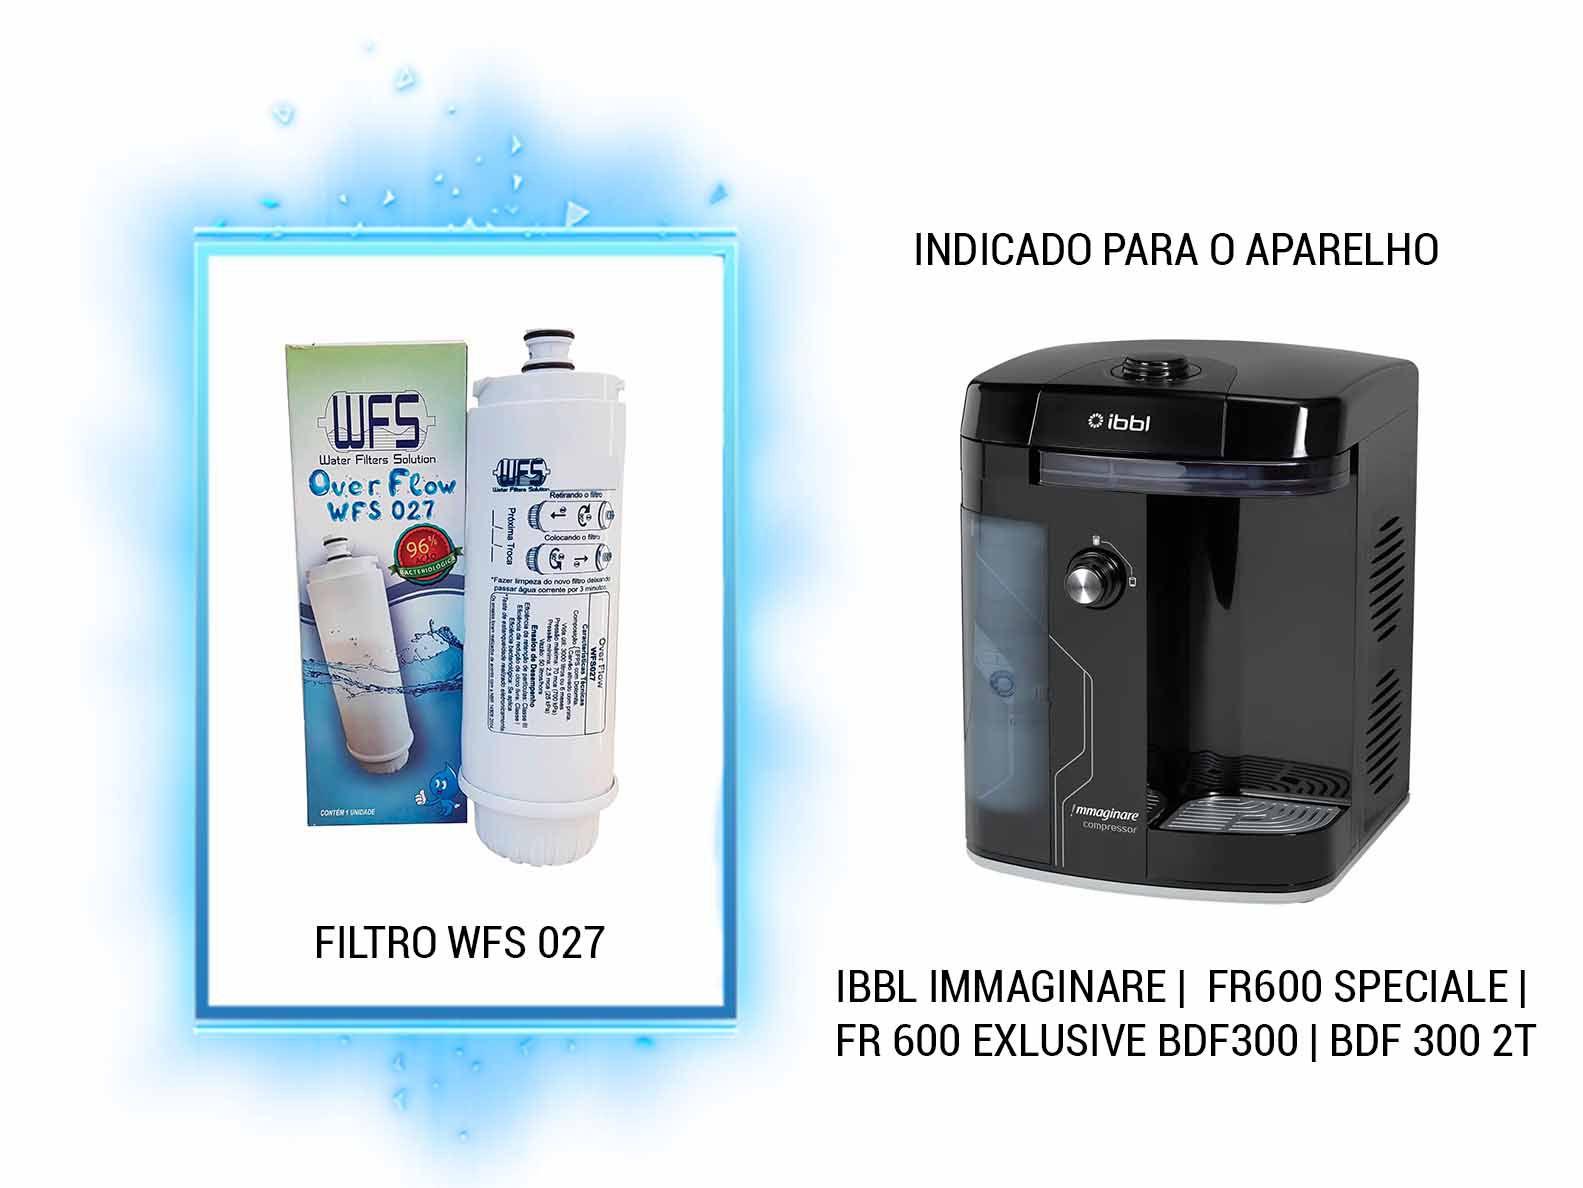 FILTRO BEBEDOURO (OVER FLOW) IBBL CZ+7 IMMAGINARE Refil Filtro Purificador Ibbl C+3 Cz+7 Fr600 Immaginare (OVER FLOW)